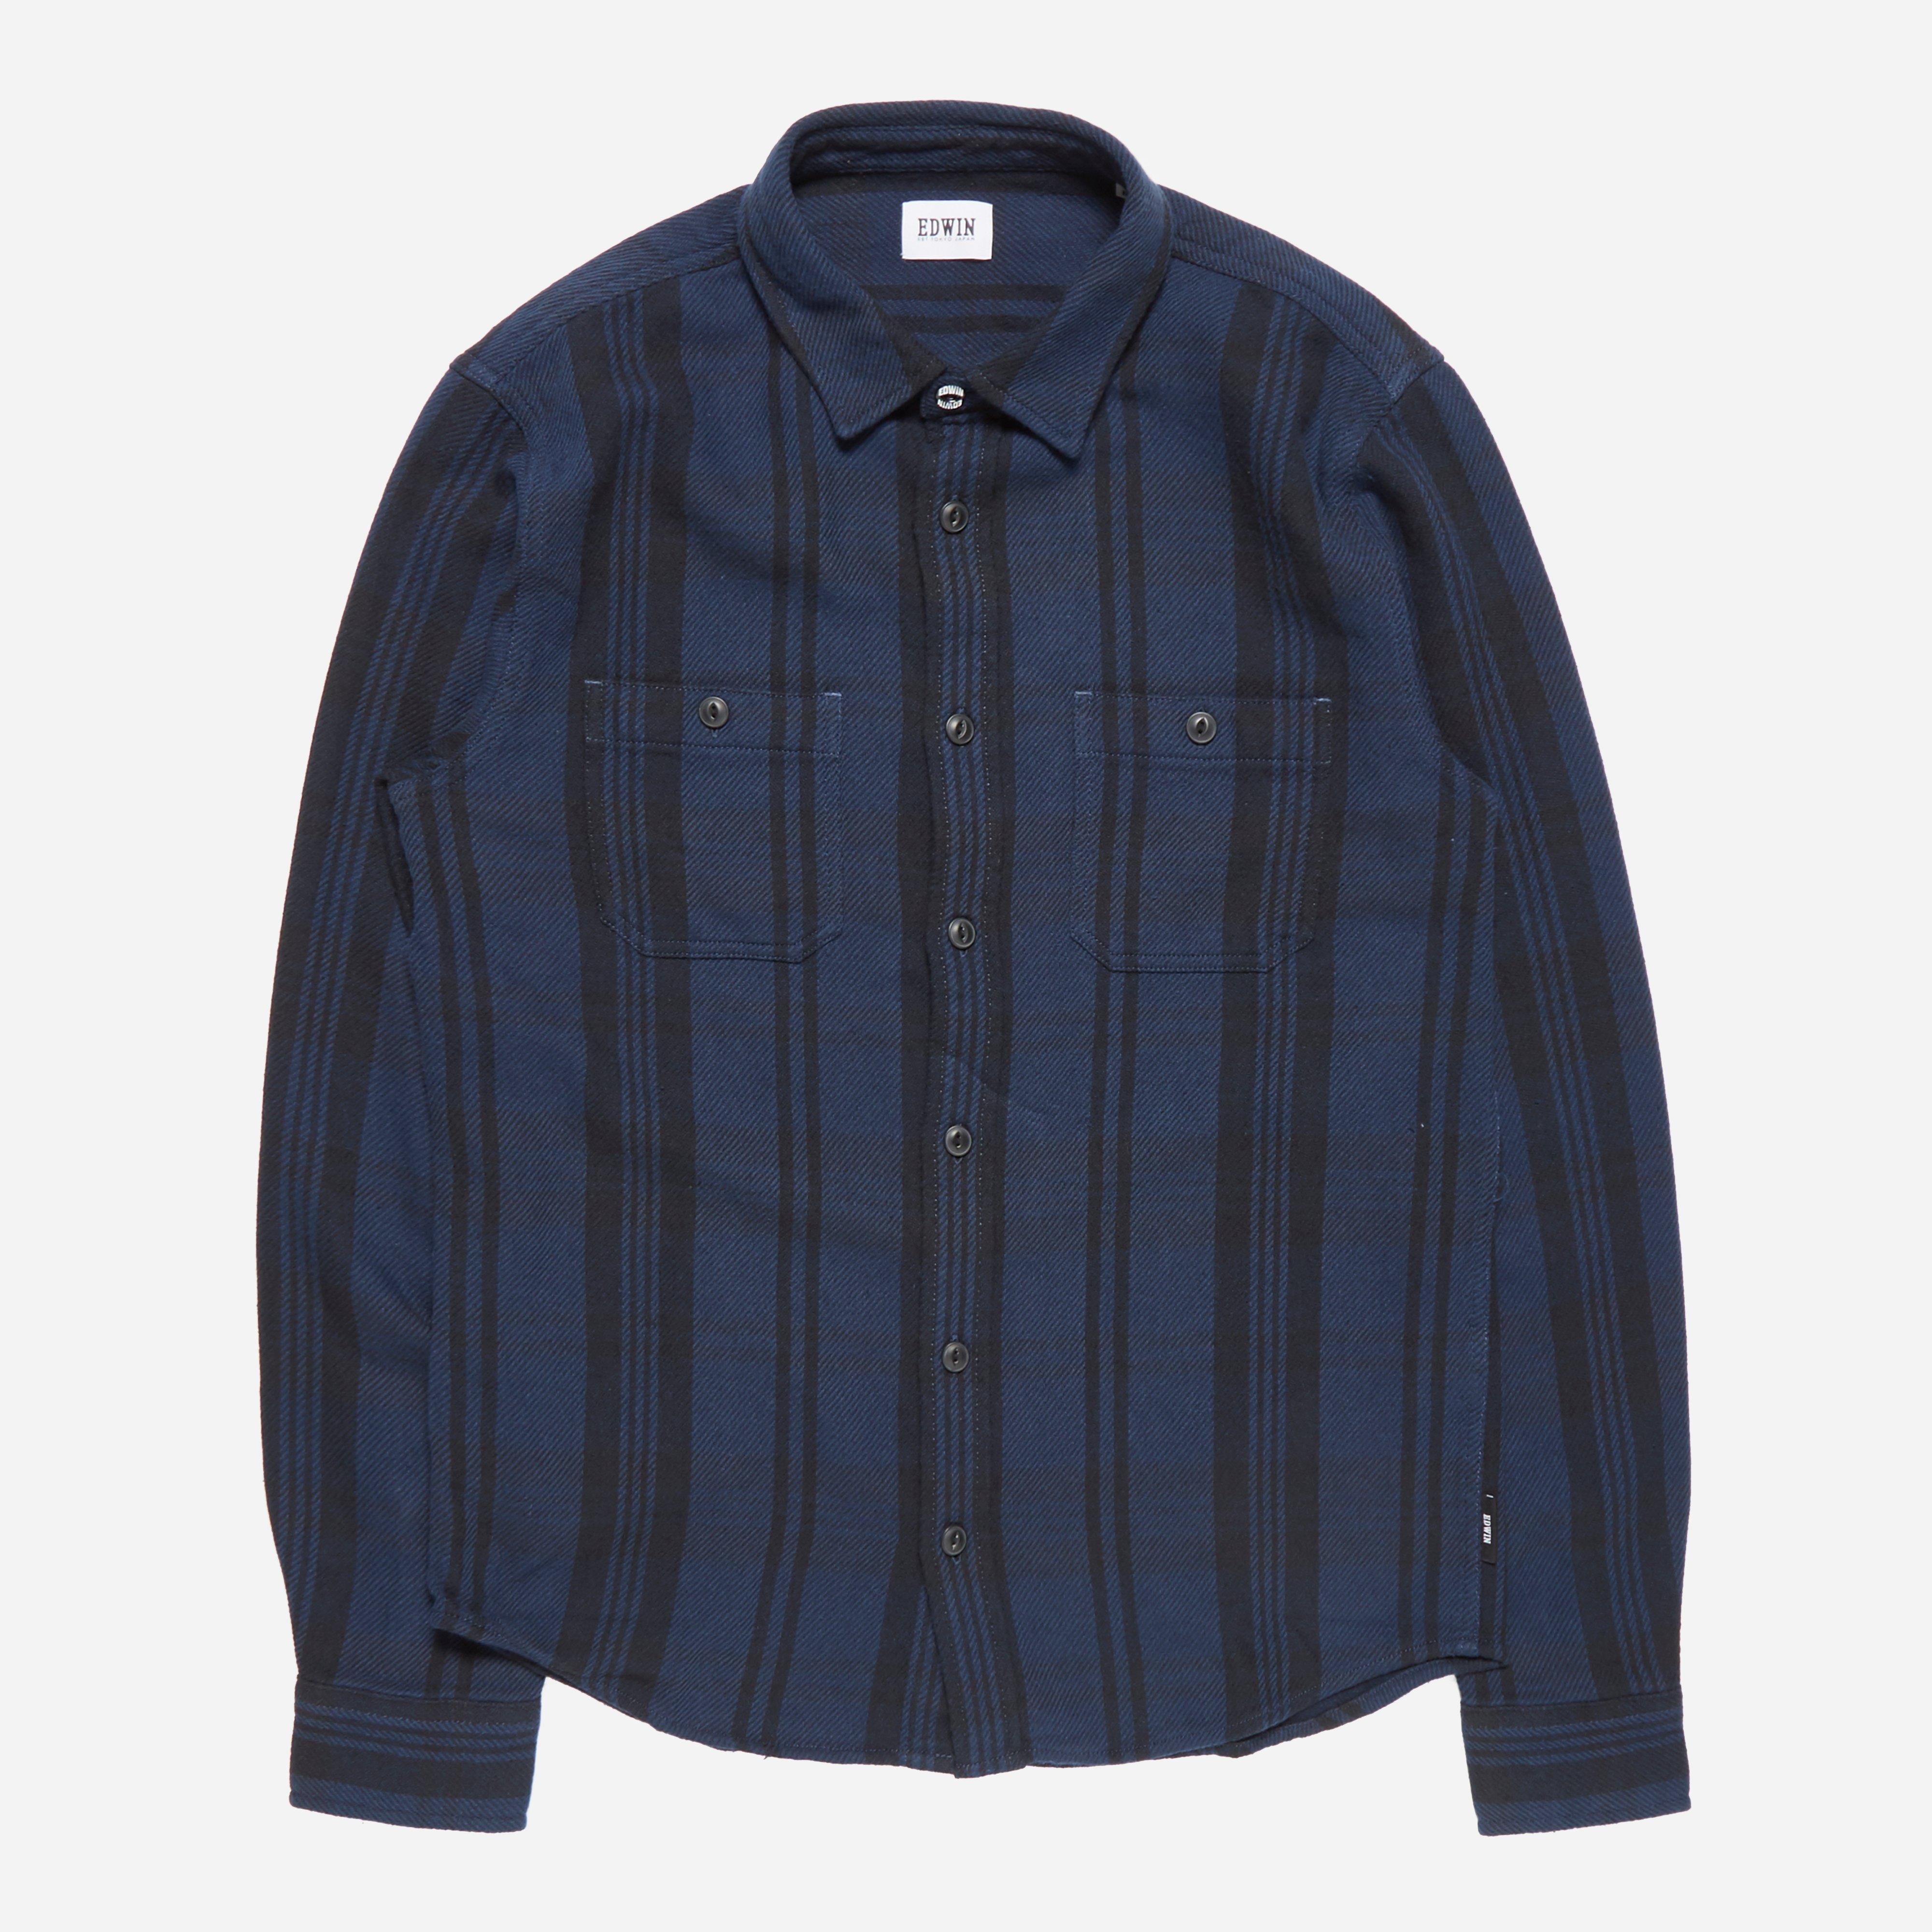 Edwin Flannel Labour Check Shirt